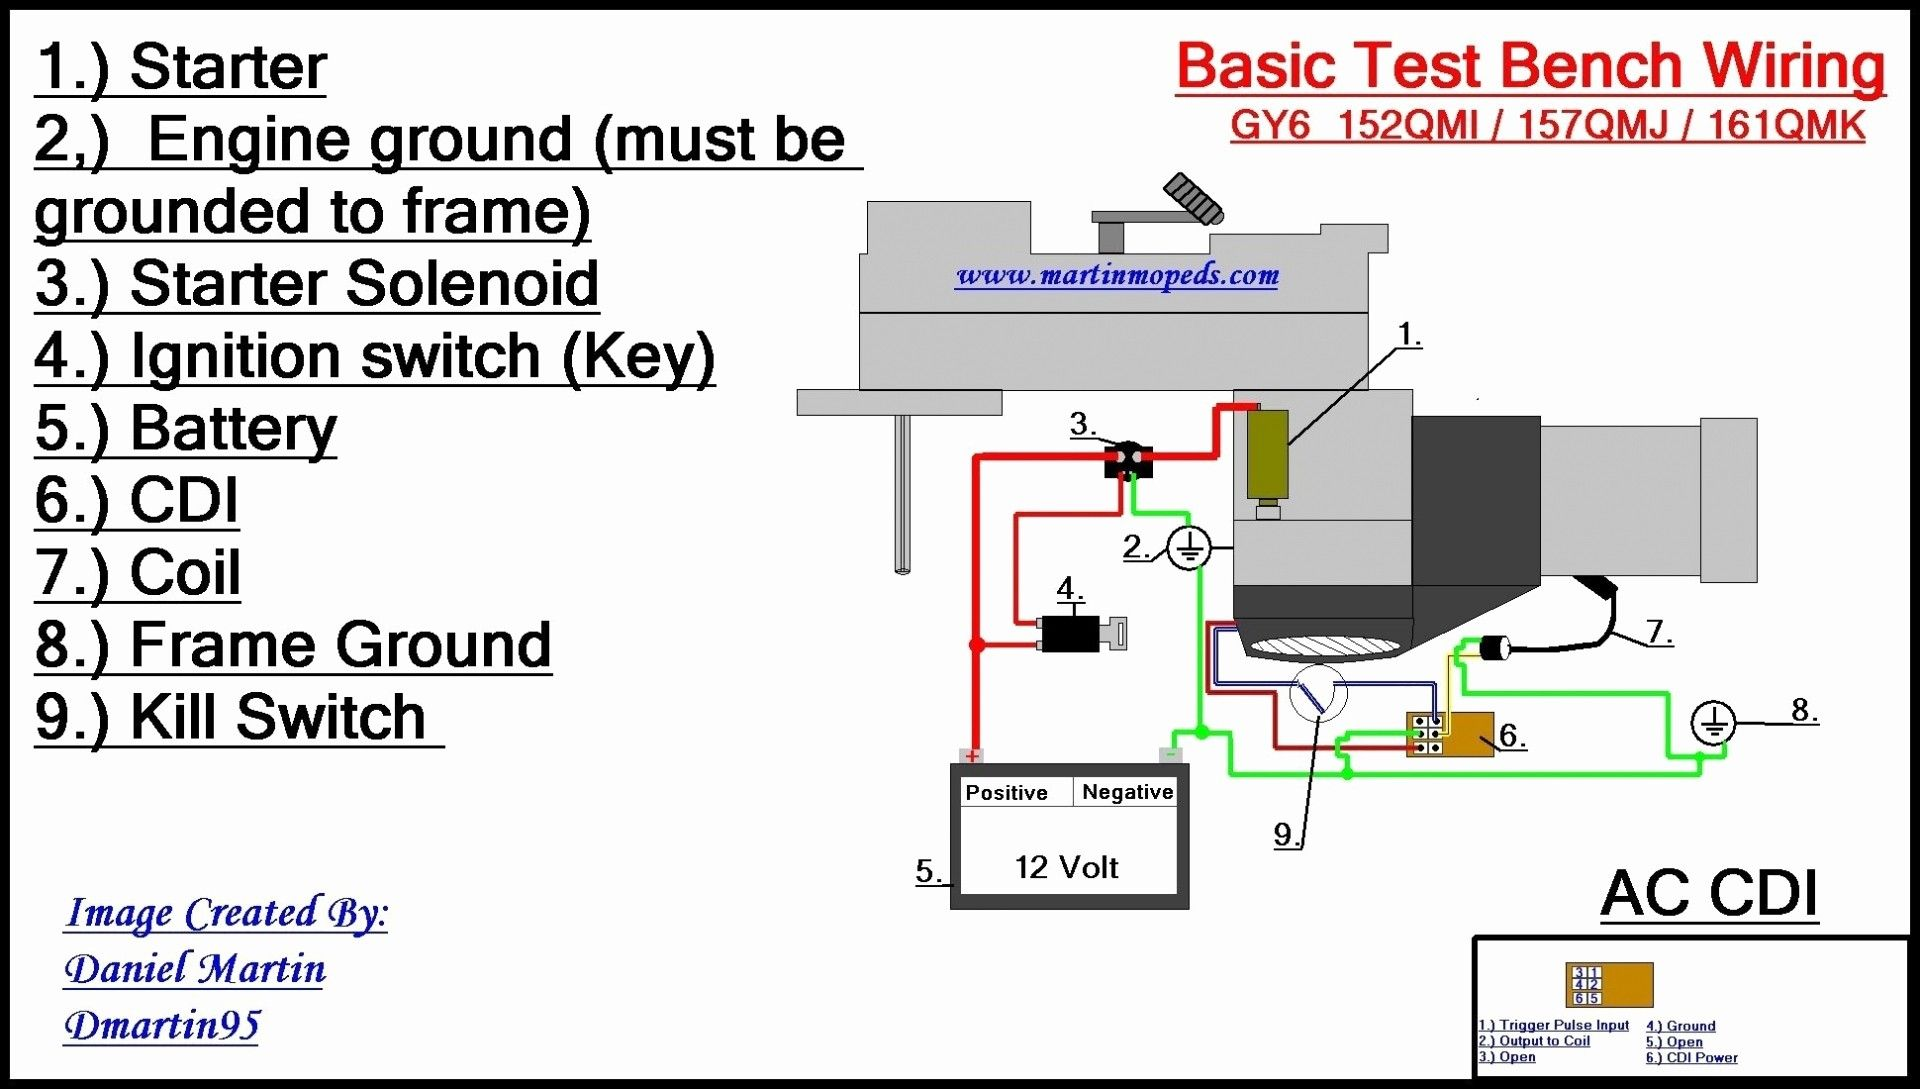 unique wiring diagram for emergency key switch #diagram #diagramsample  #diagramtemplate #wiringdiagram… | kill switch, electrical diagram,  electrical wiring diagram  pinterest